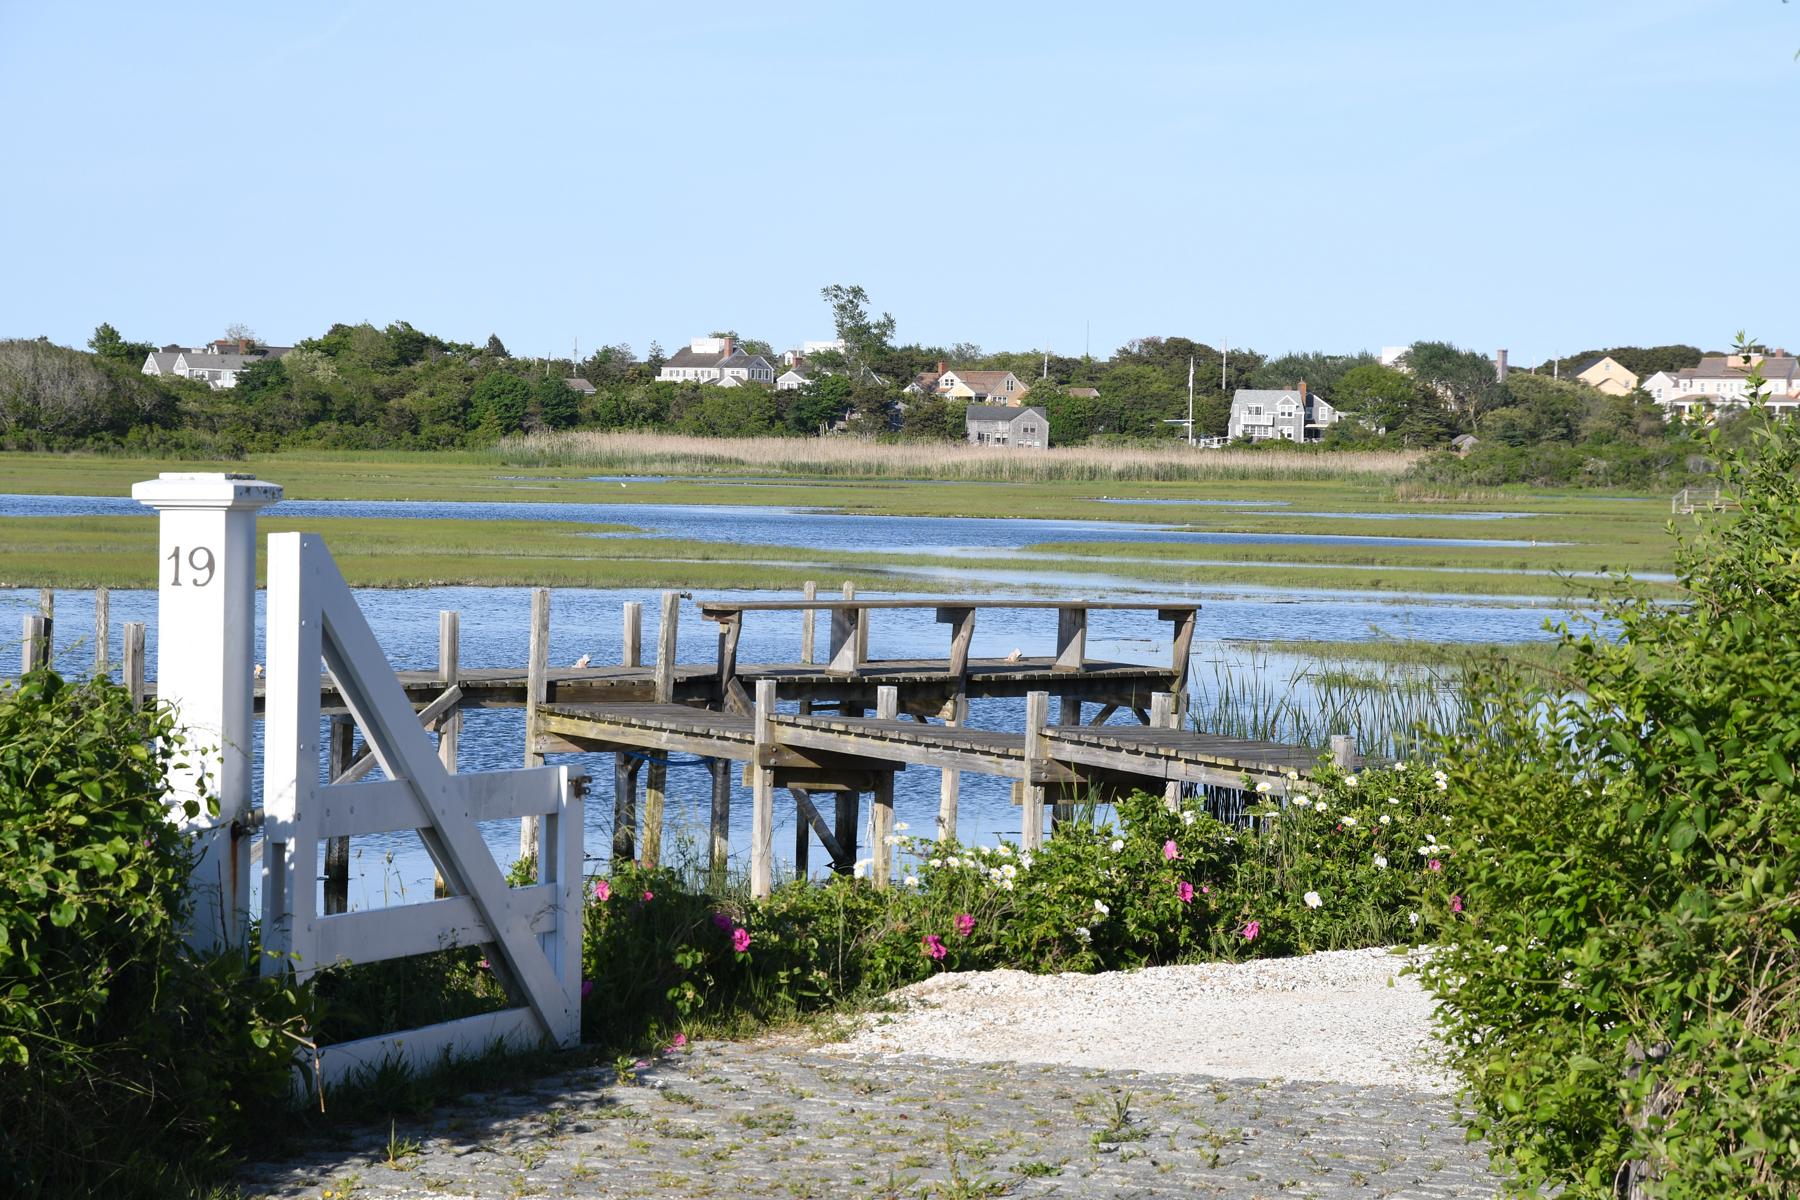 Moradia para Venda às Expansive Harbor Views and Private Dockage 19 East Creek Road Nantucket, Massachusetts, 02554 Estados Unidos